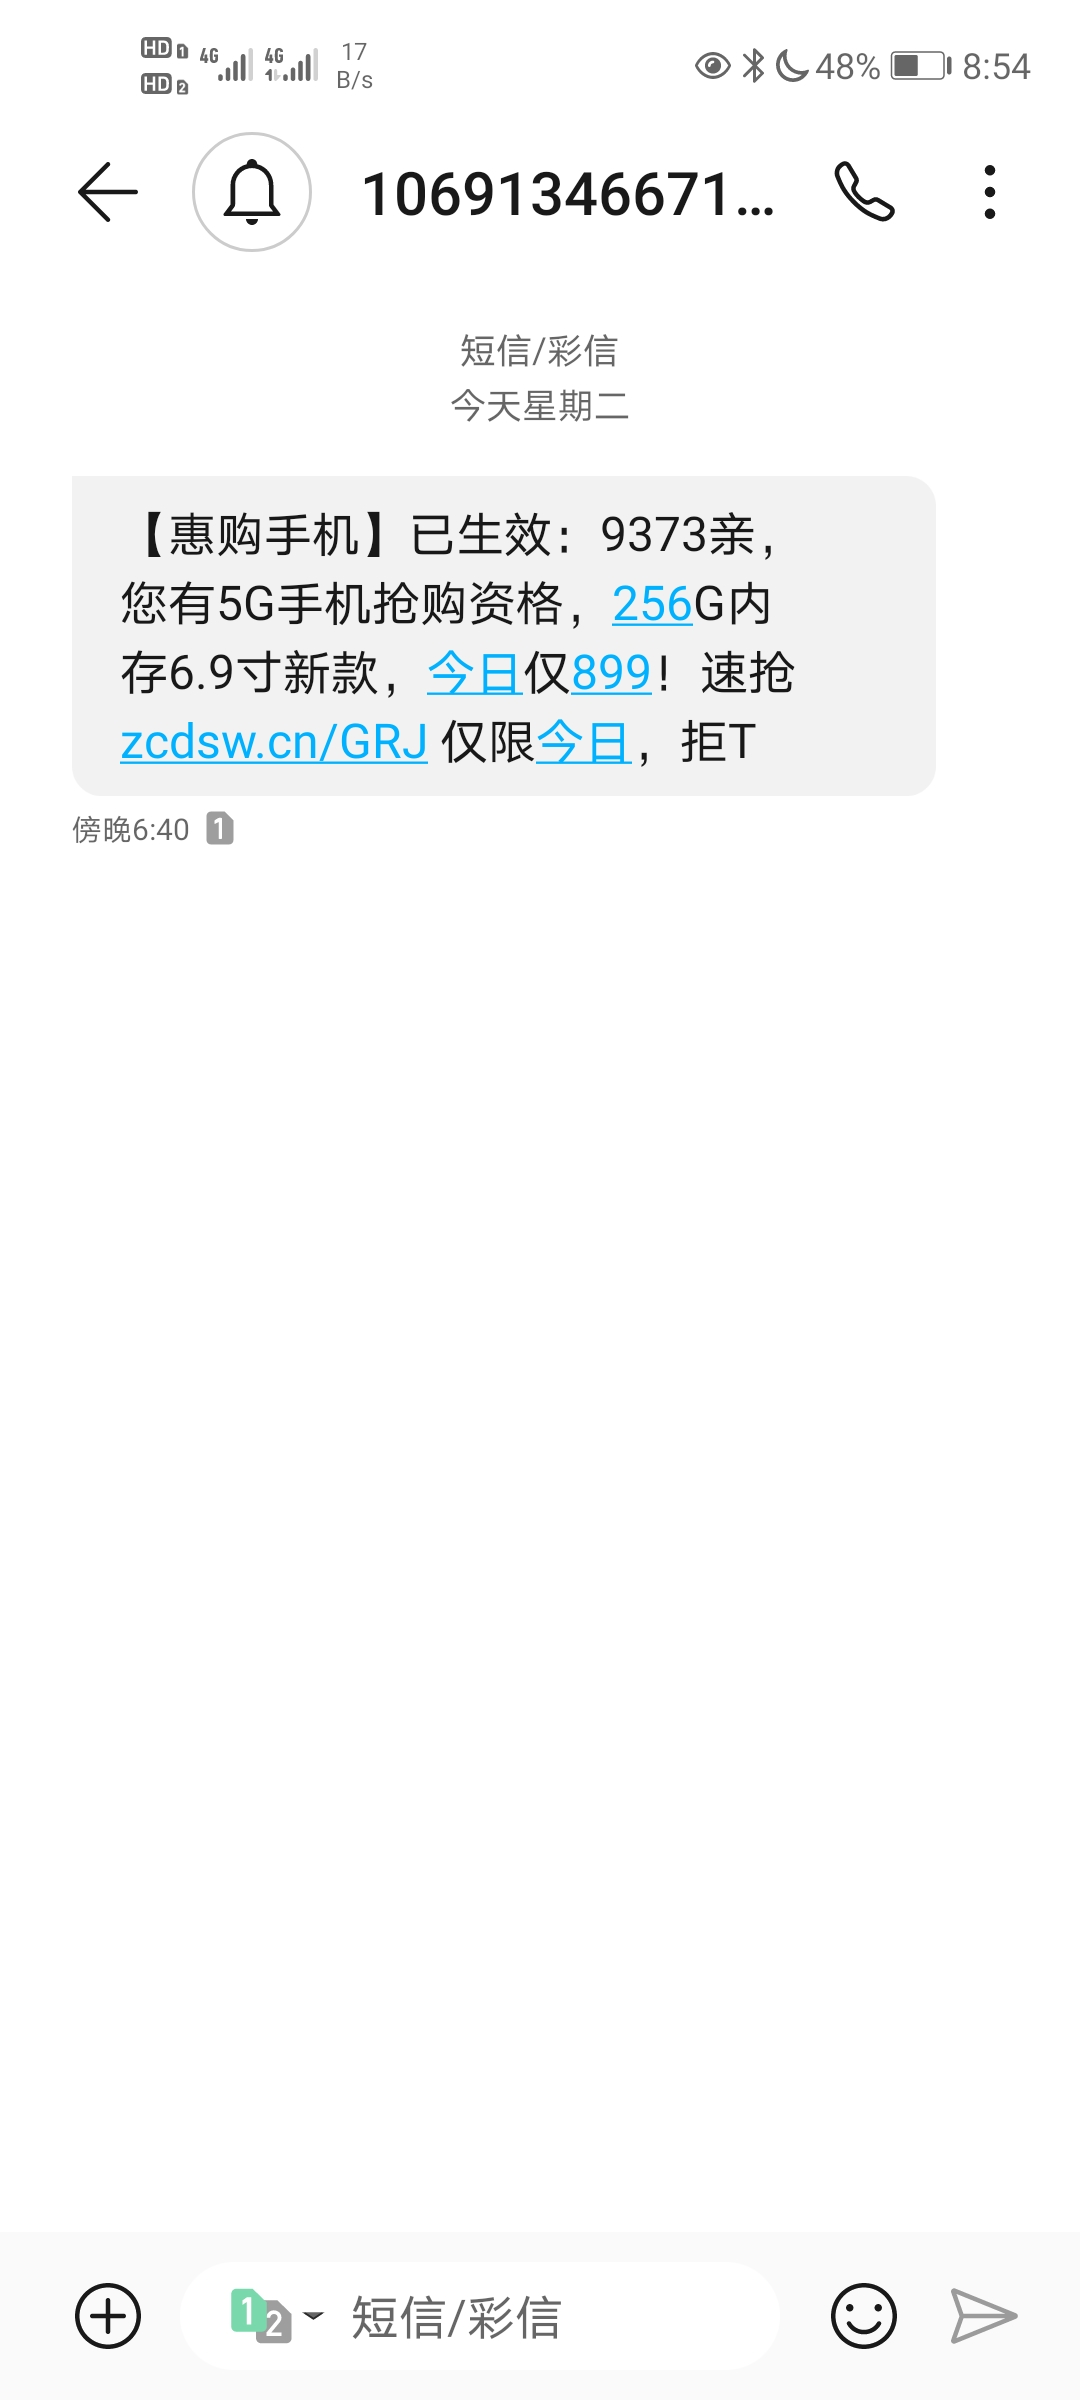 Screenshot_20210622_205454_com.android.mms.jpg